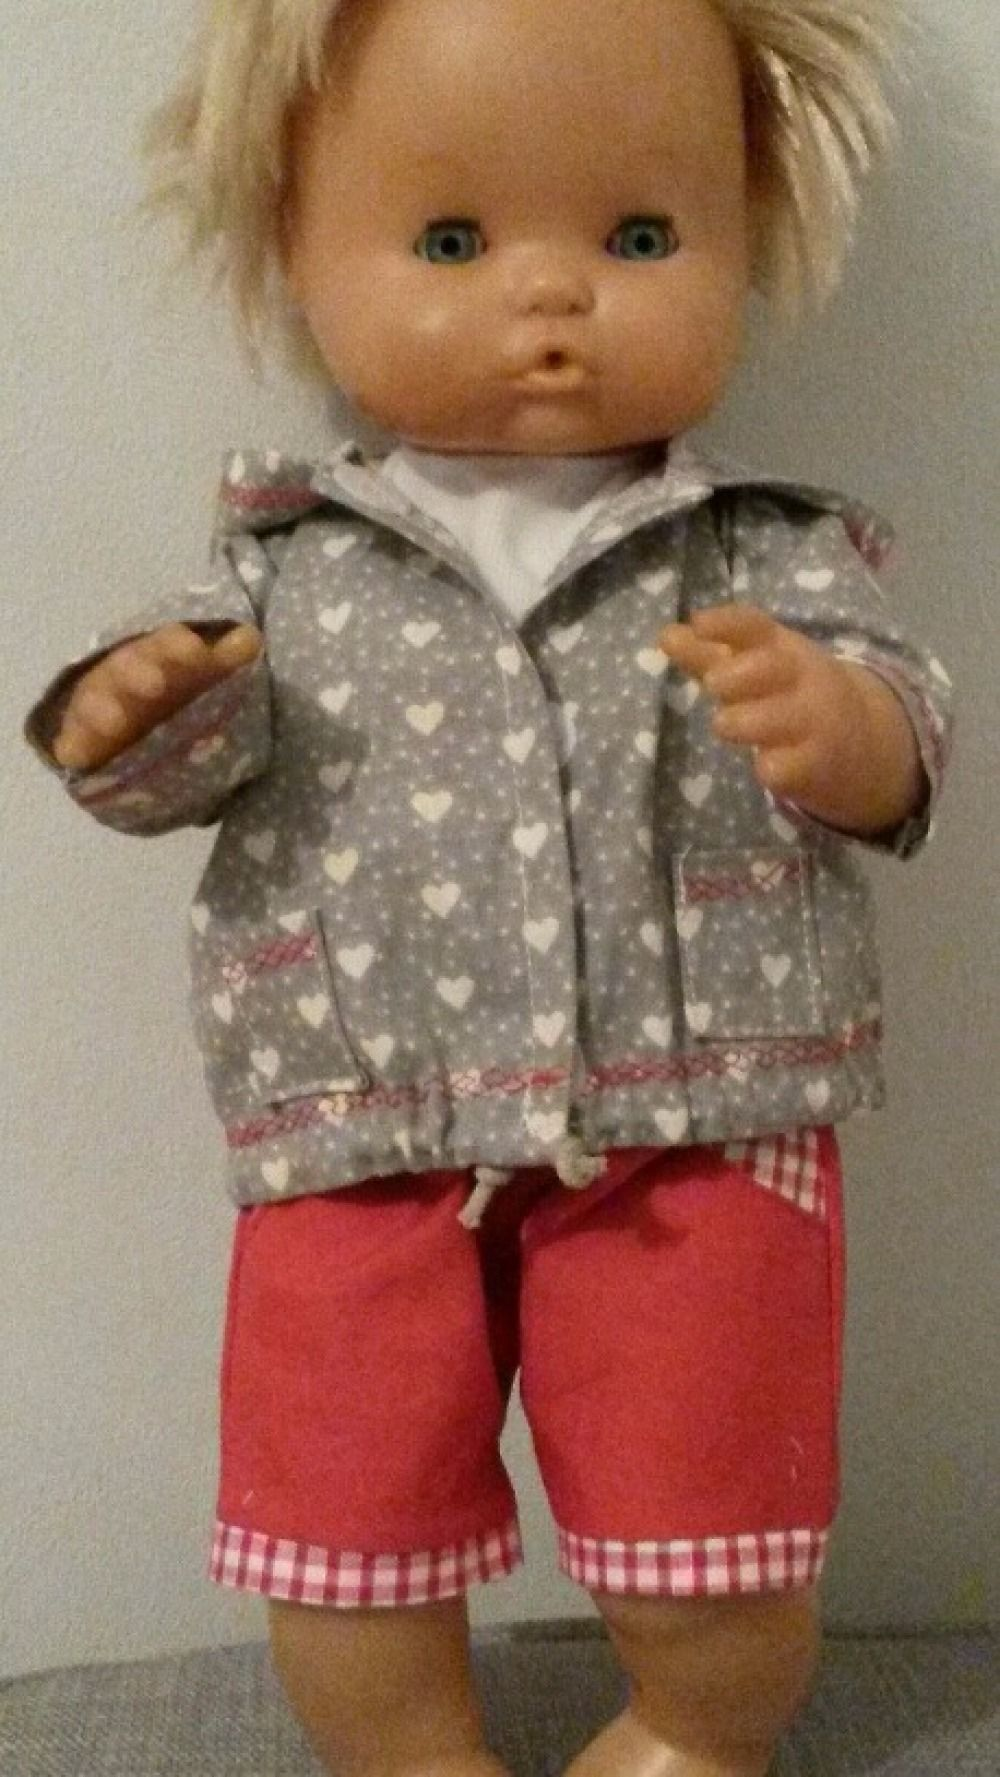 788c53d15e10c Coffret Vêtement de poupon 36 a 40 cm ensemble blouson bermuda tee shirt